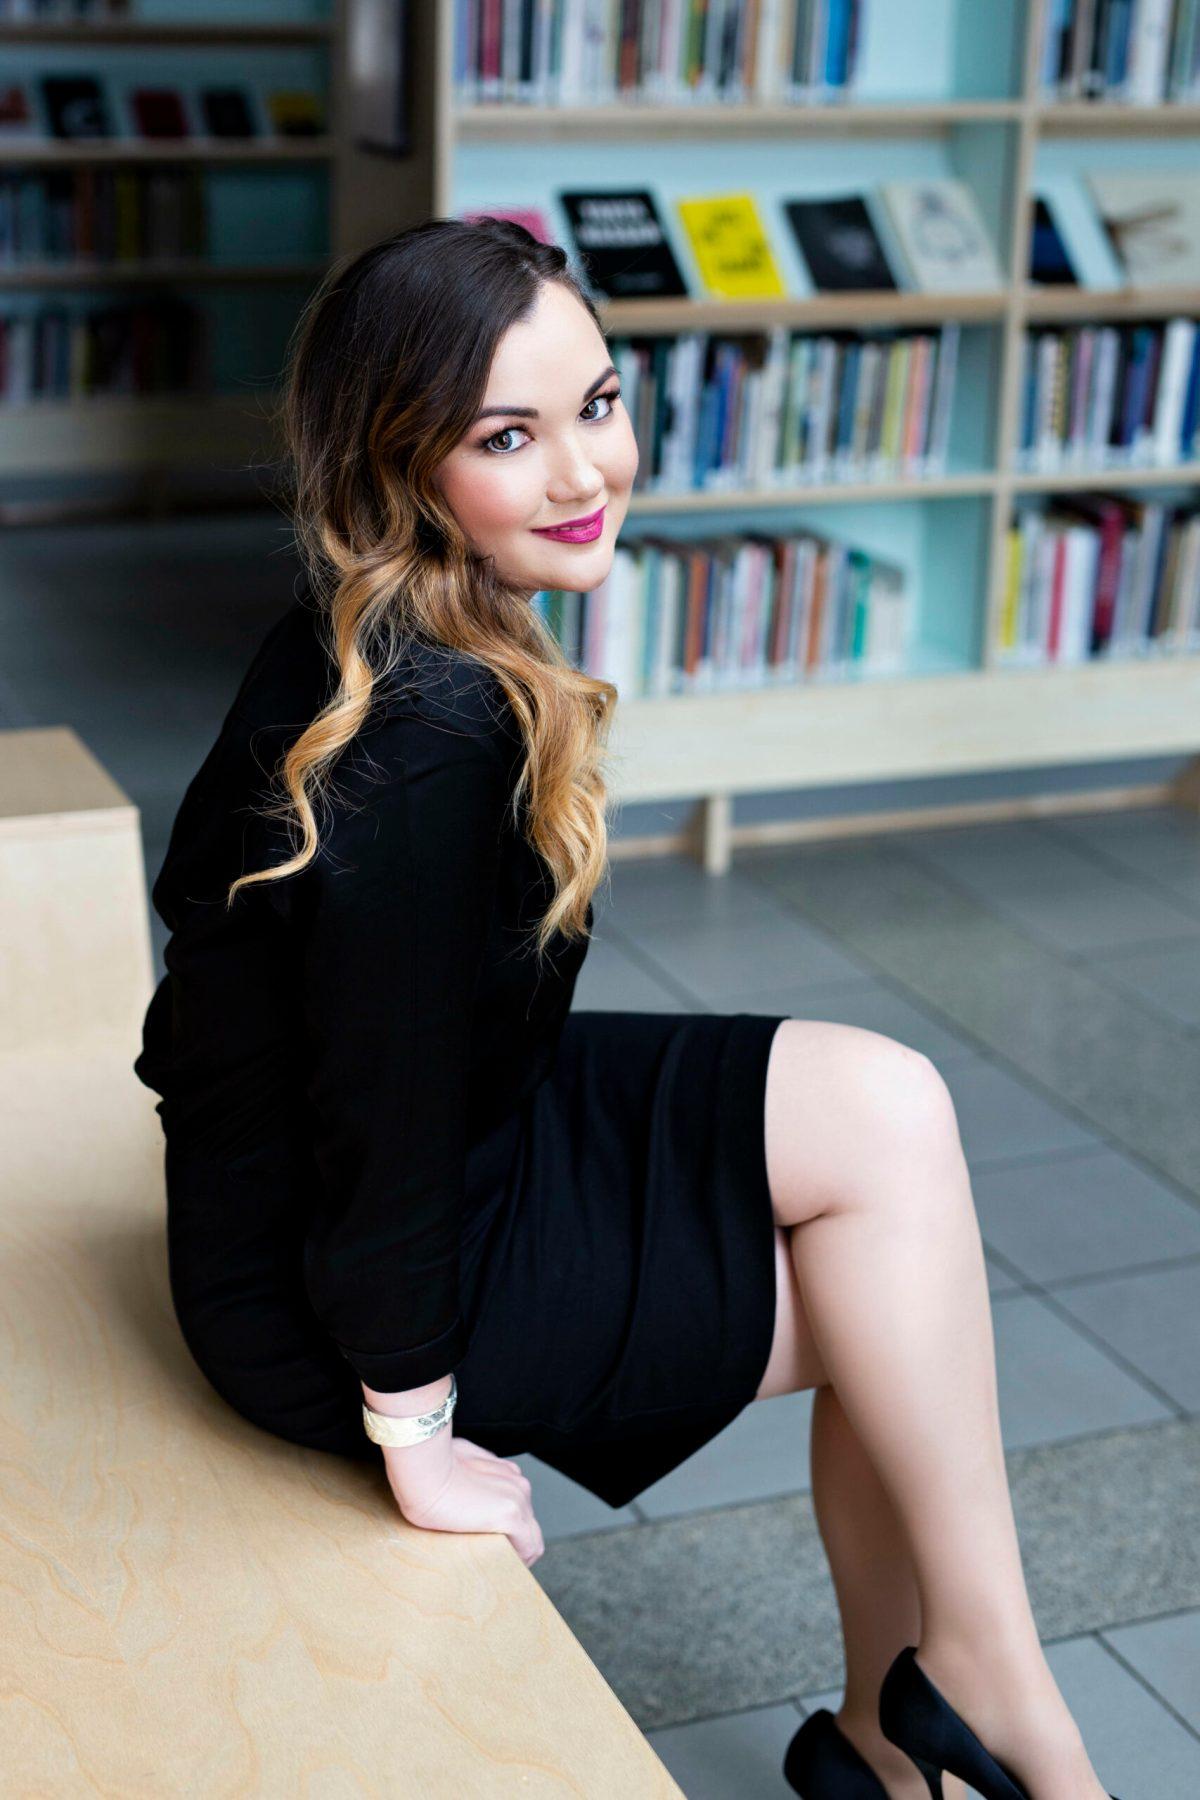 Estelle Pettersen author